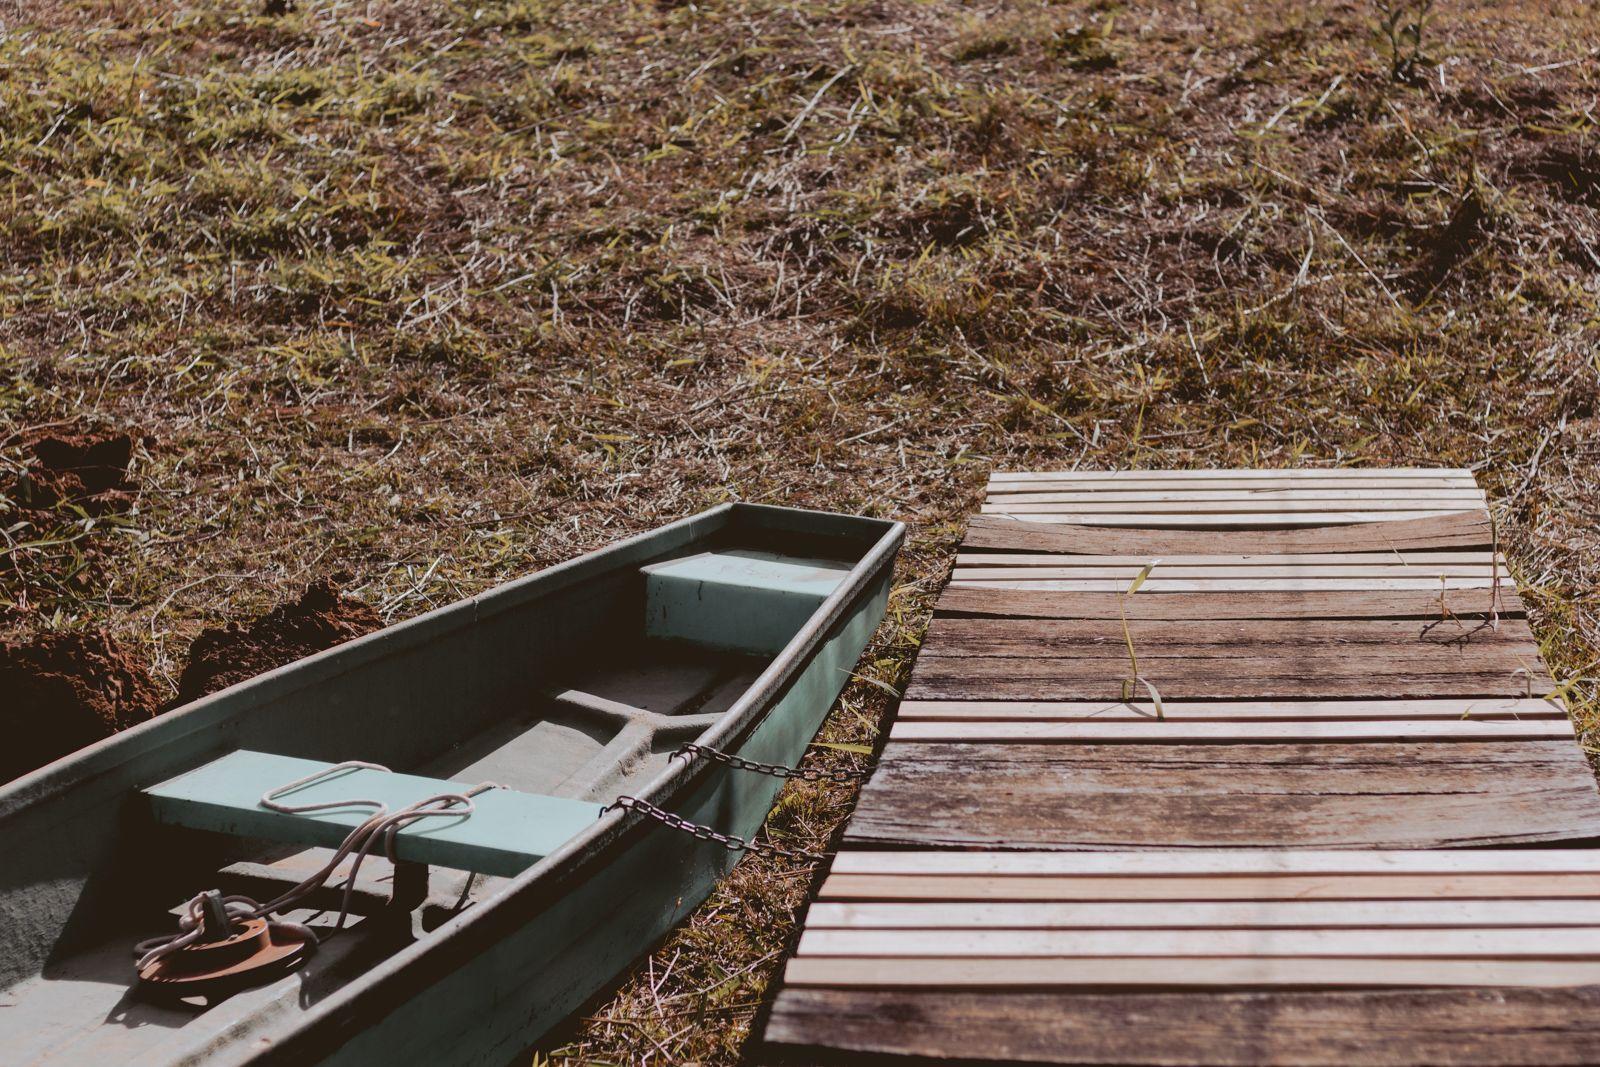 barco e palanque de madeira